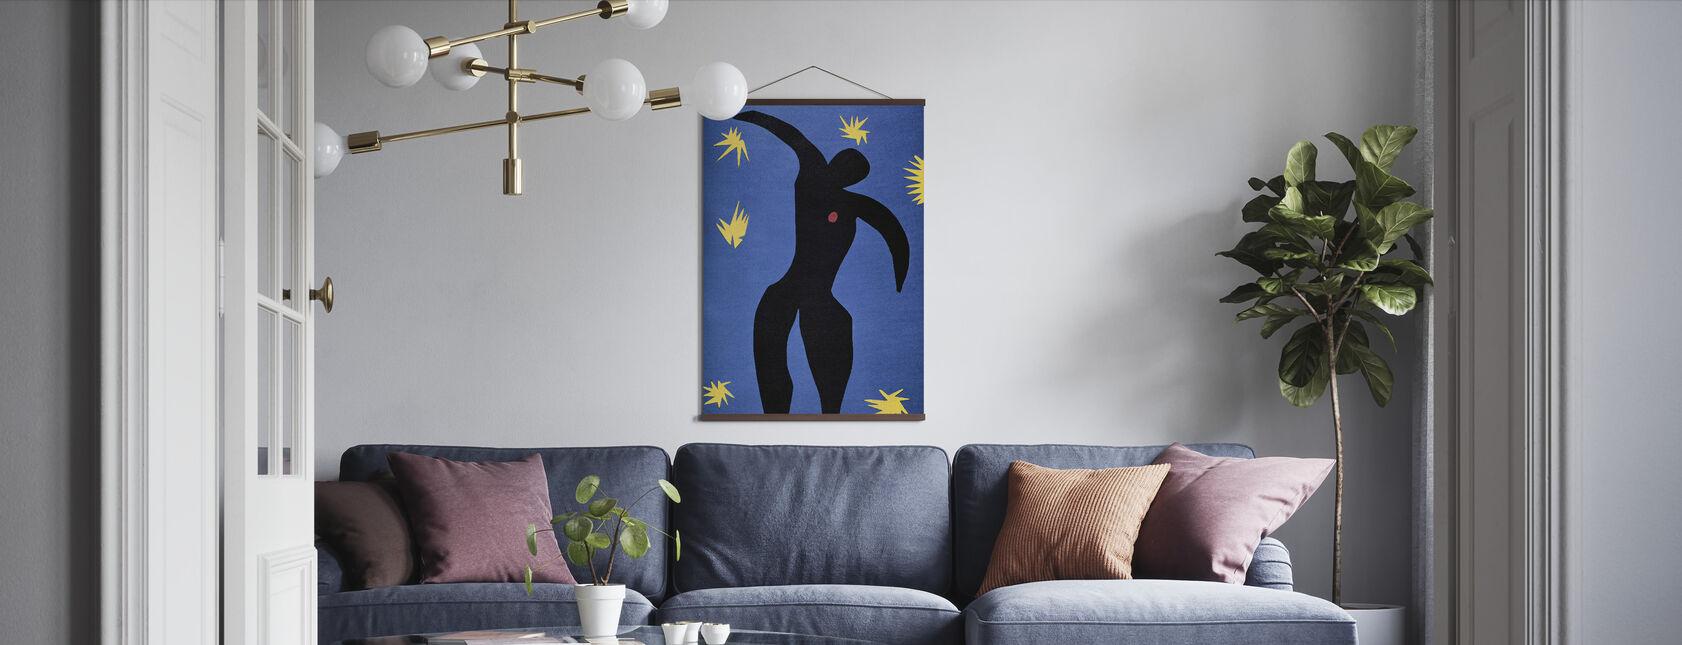 Icarus in Stars - Henri Matisse - Poster - Living Room